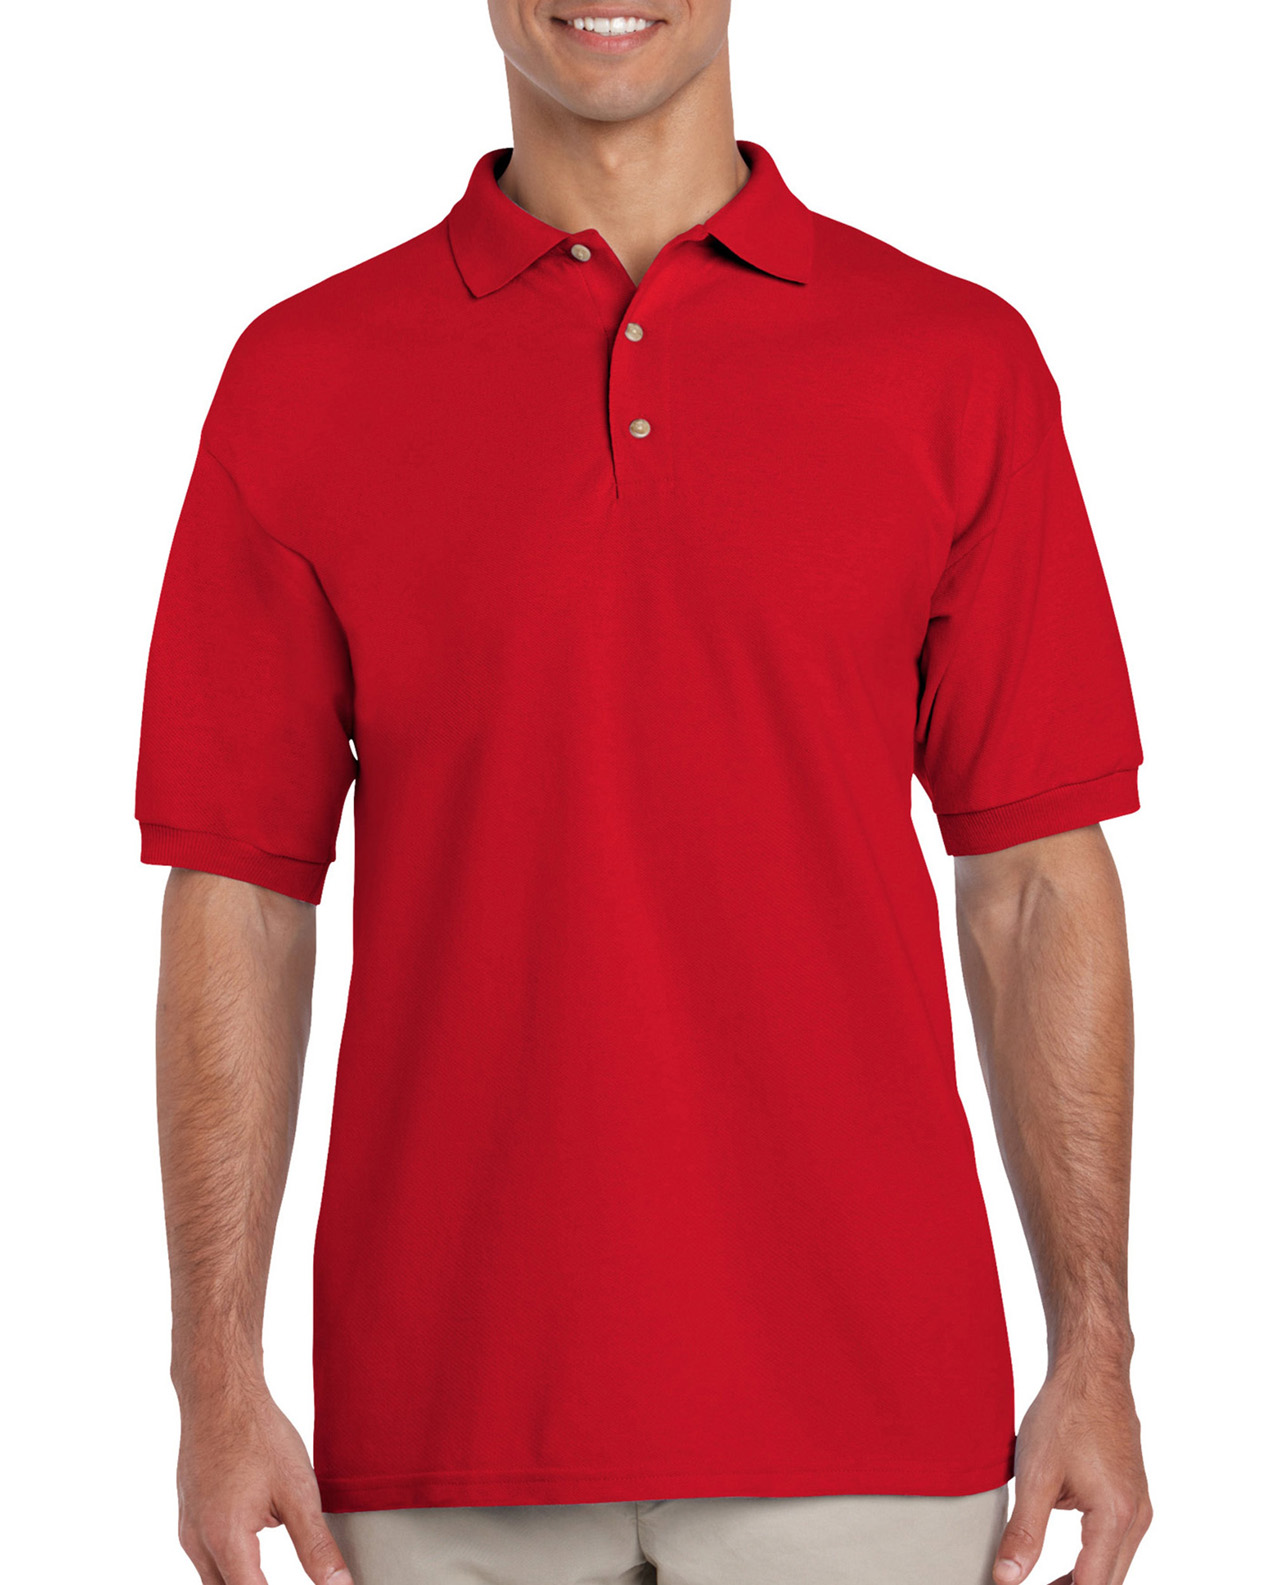 6405f80d Gildan Polo Shirts Wholesale